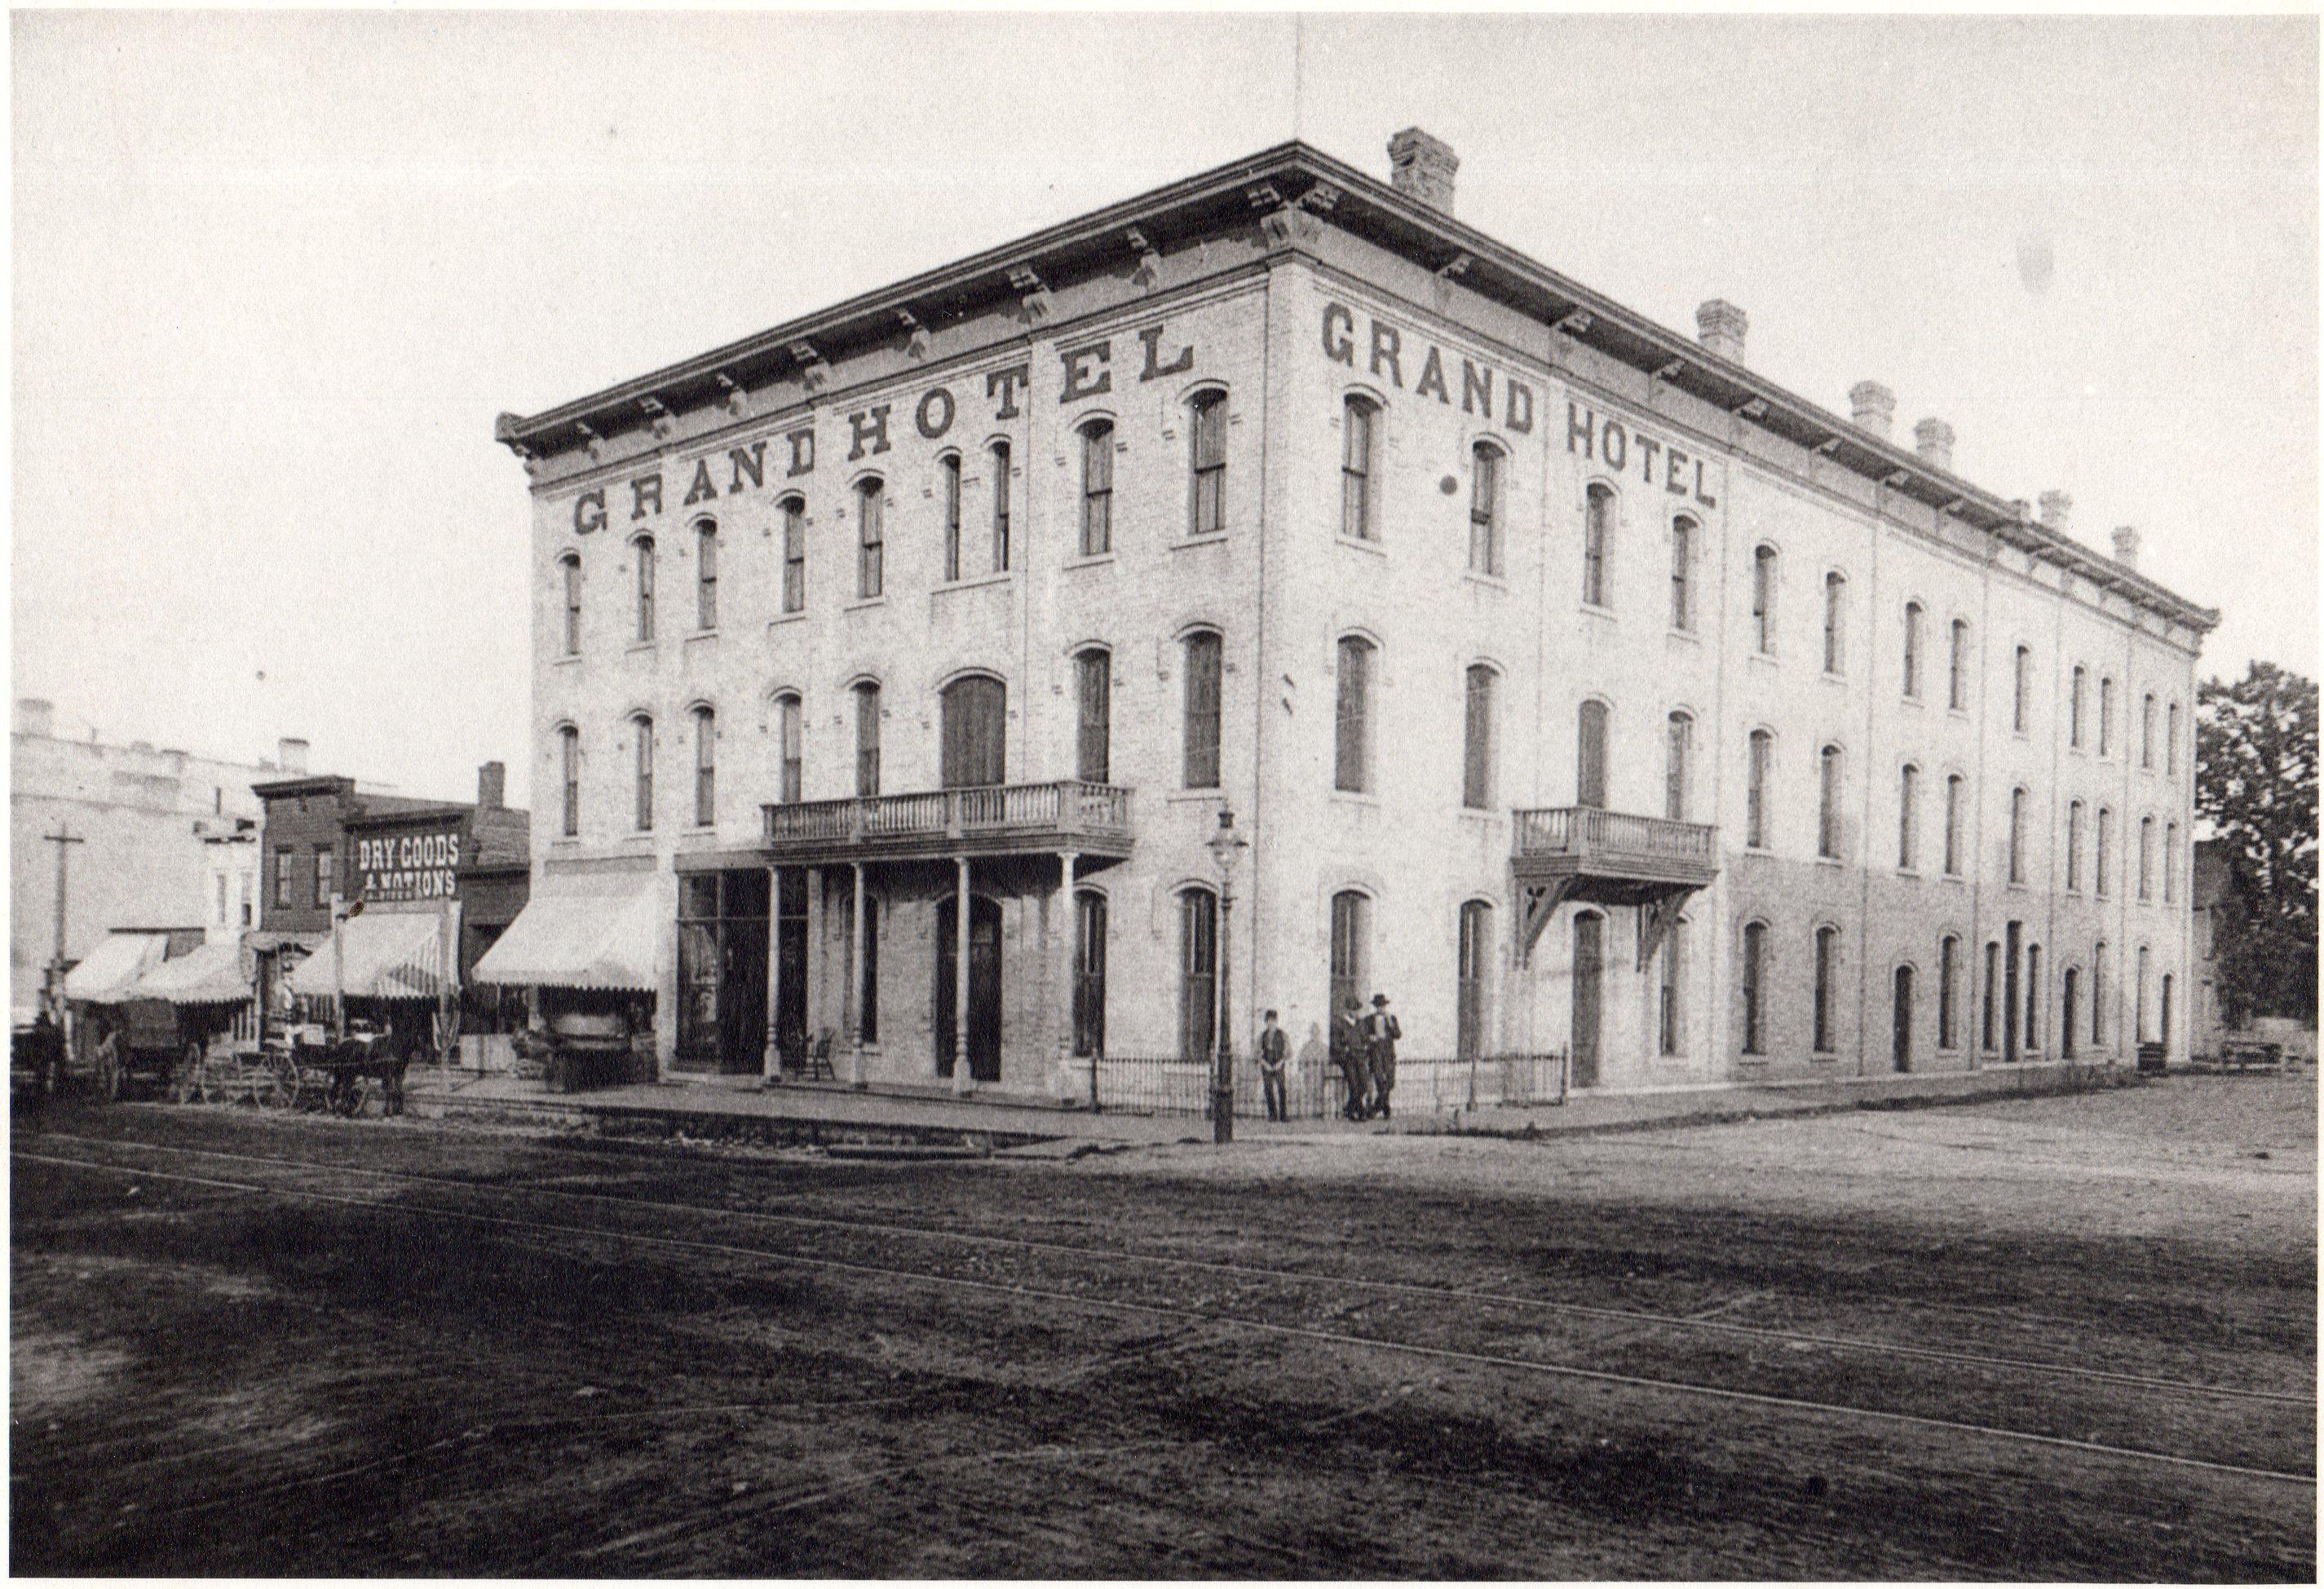 Grand Hotel c. 1888